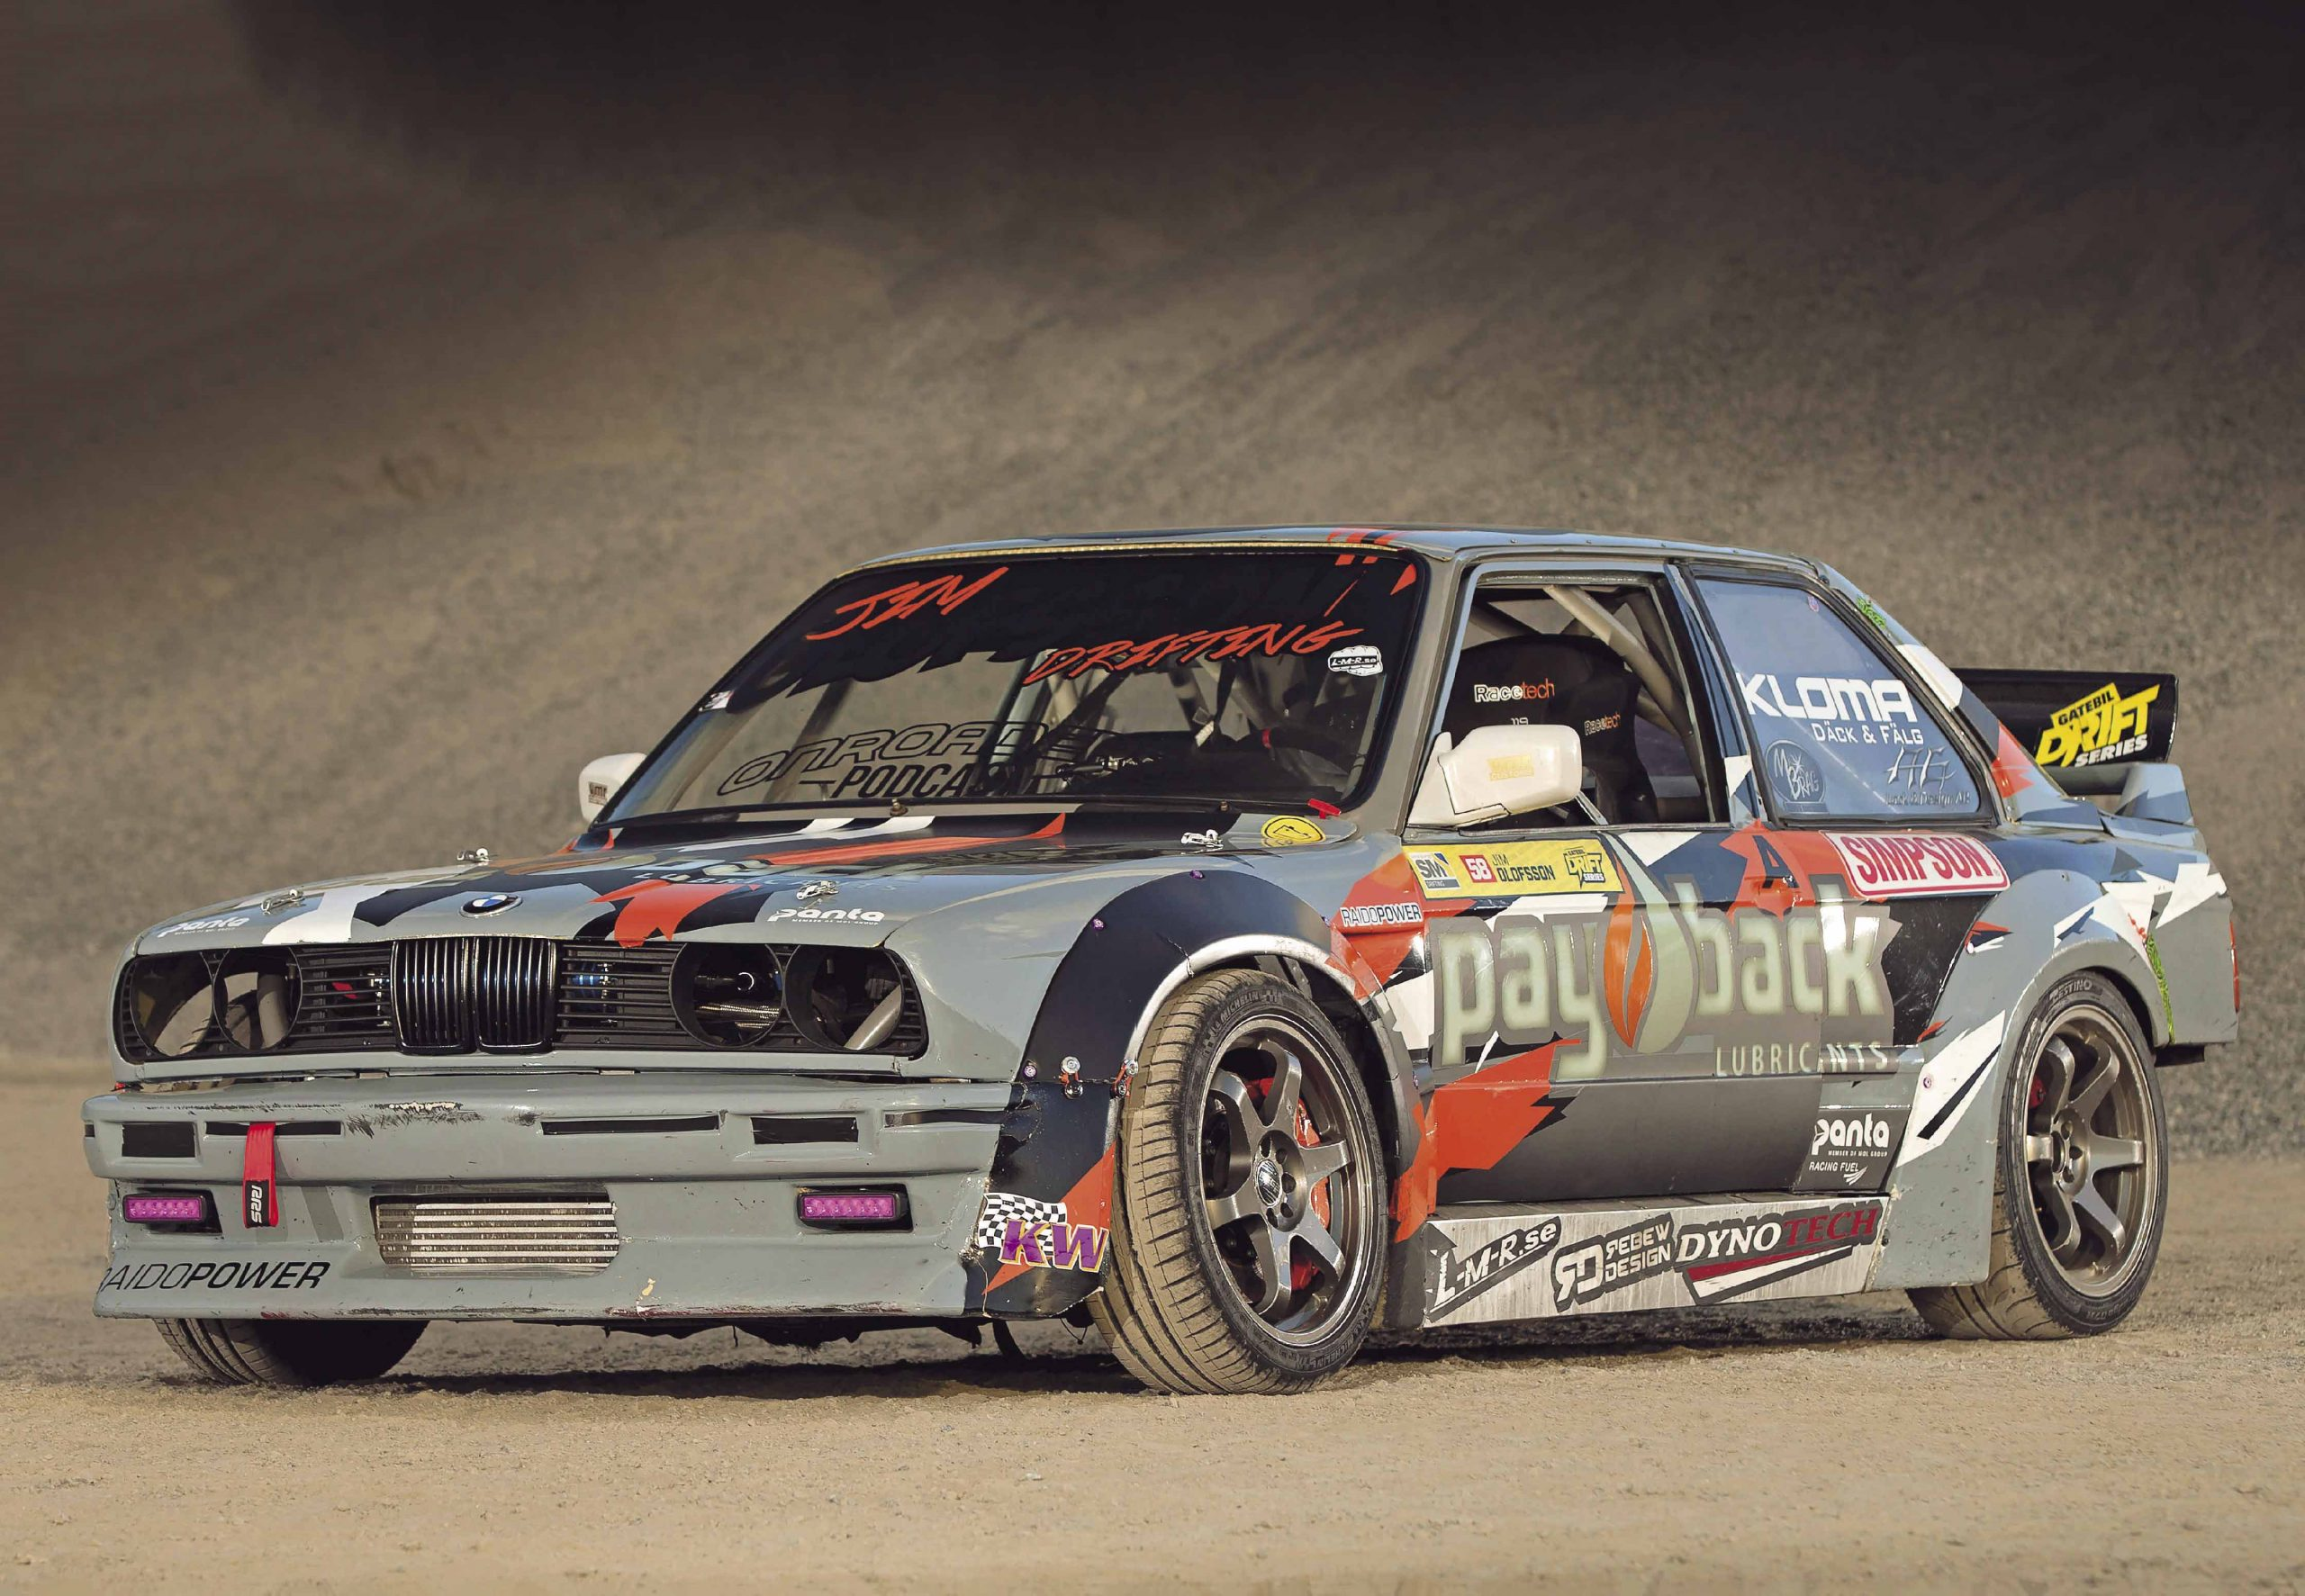 940whp M50b25 Turbo Drift Bmw E30 Coupe Drive